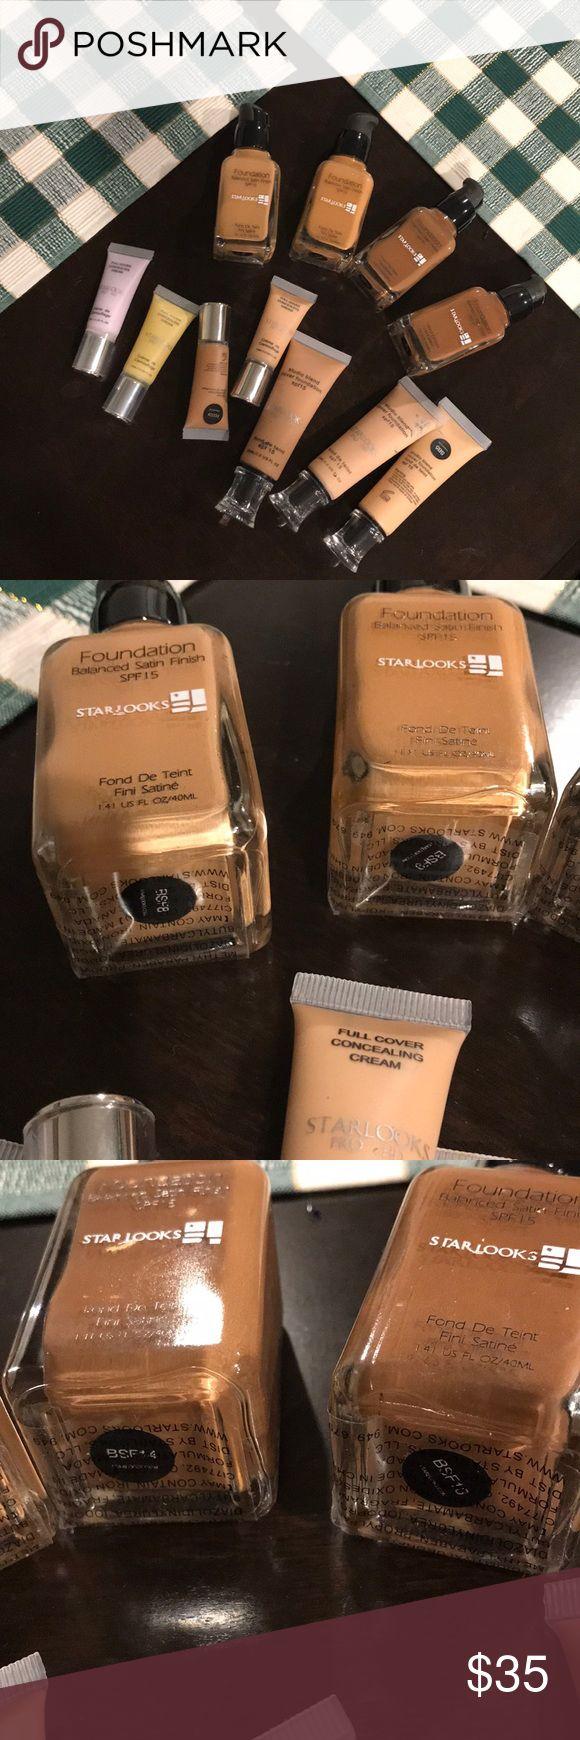 Medium to dark foundation bundle Lot of medium to dark shade of liquid foundation and concealer. Full coverage Makeup Foundation